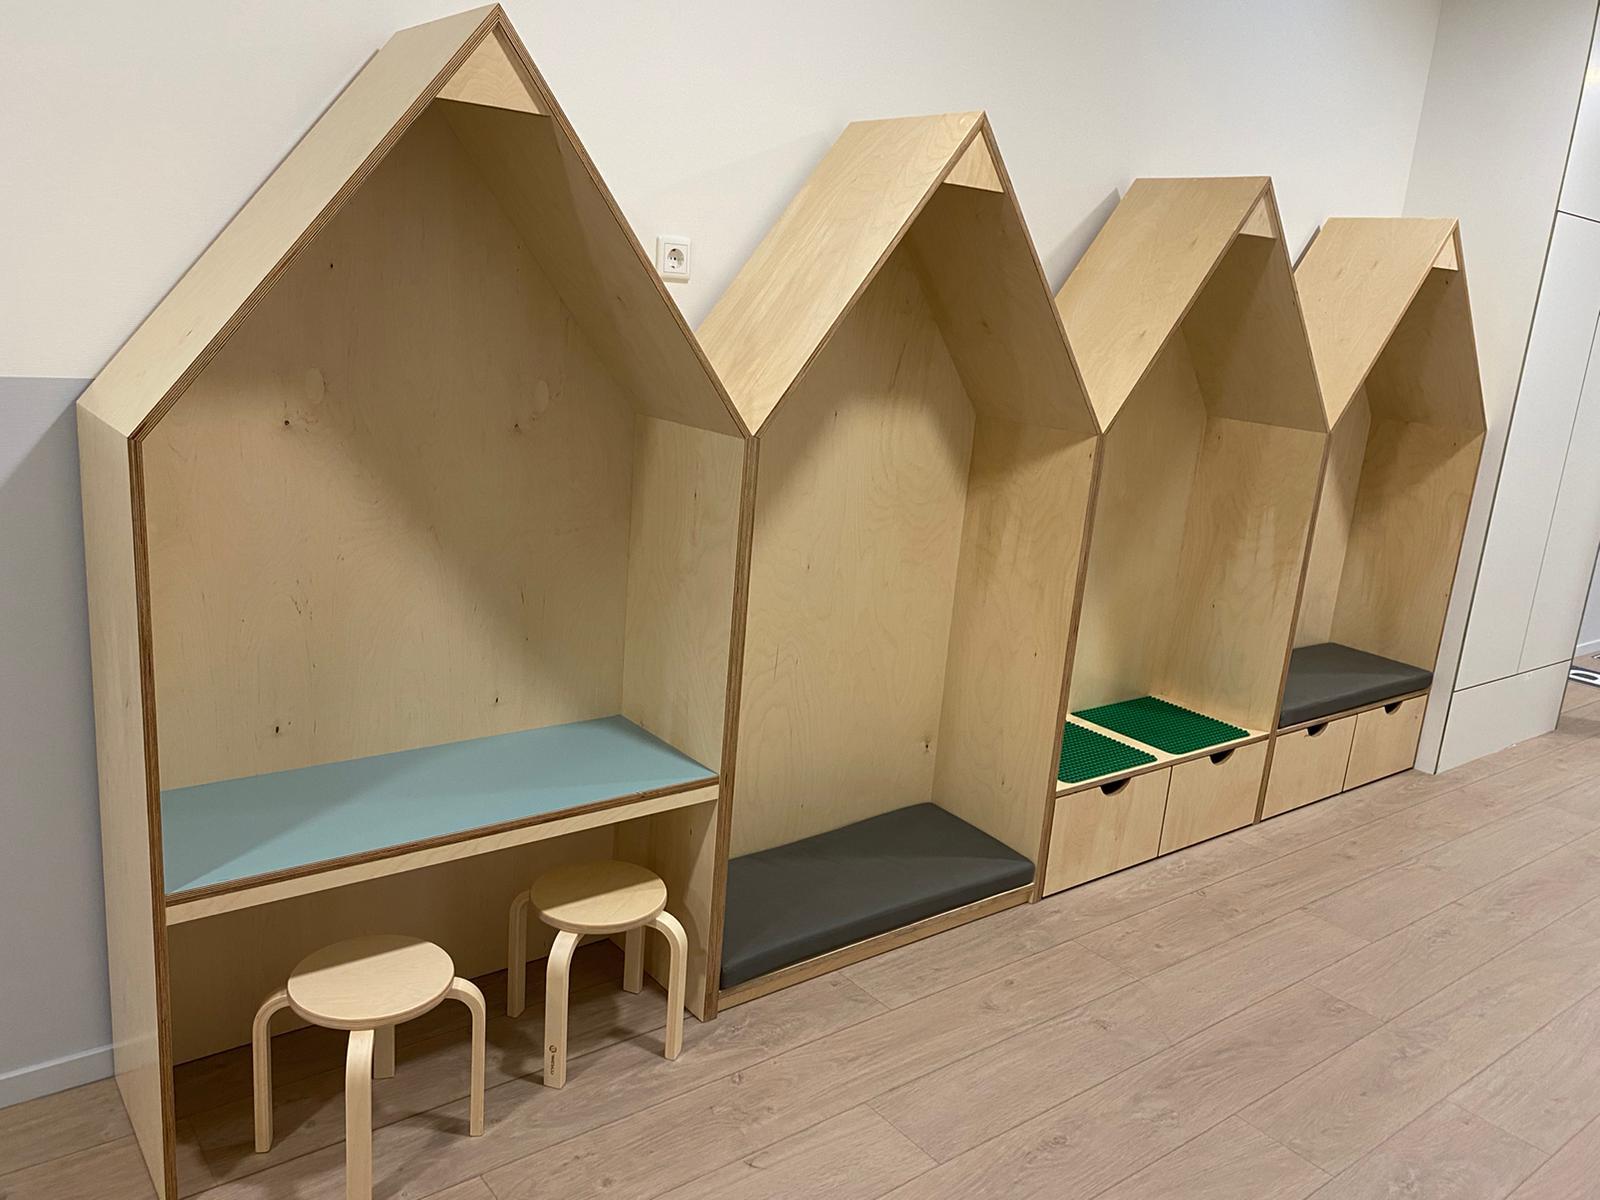 Interieur kinderdagverblijf Klimop